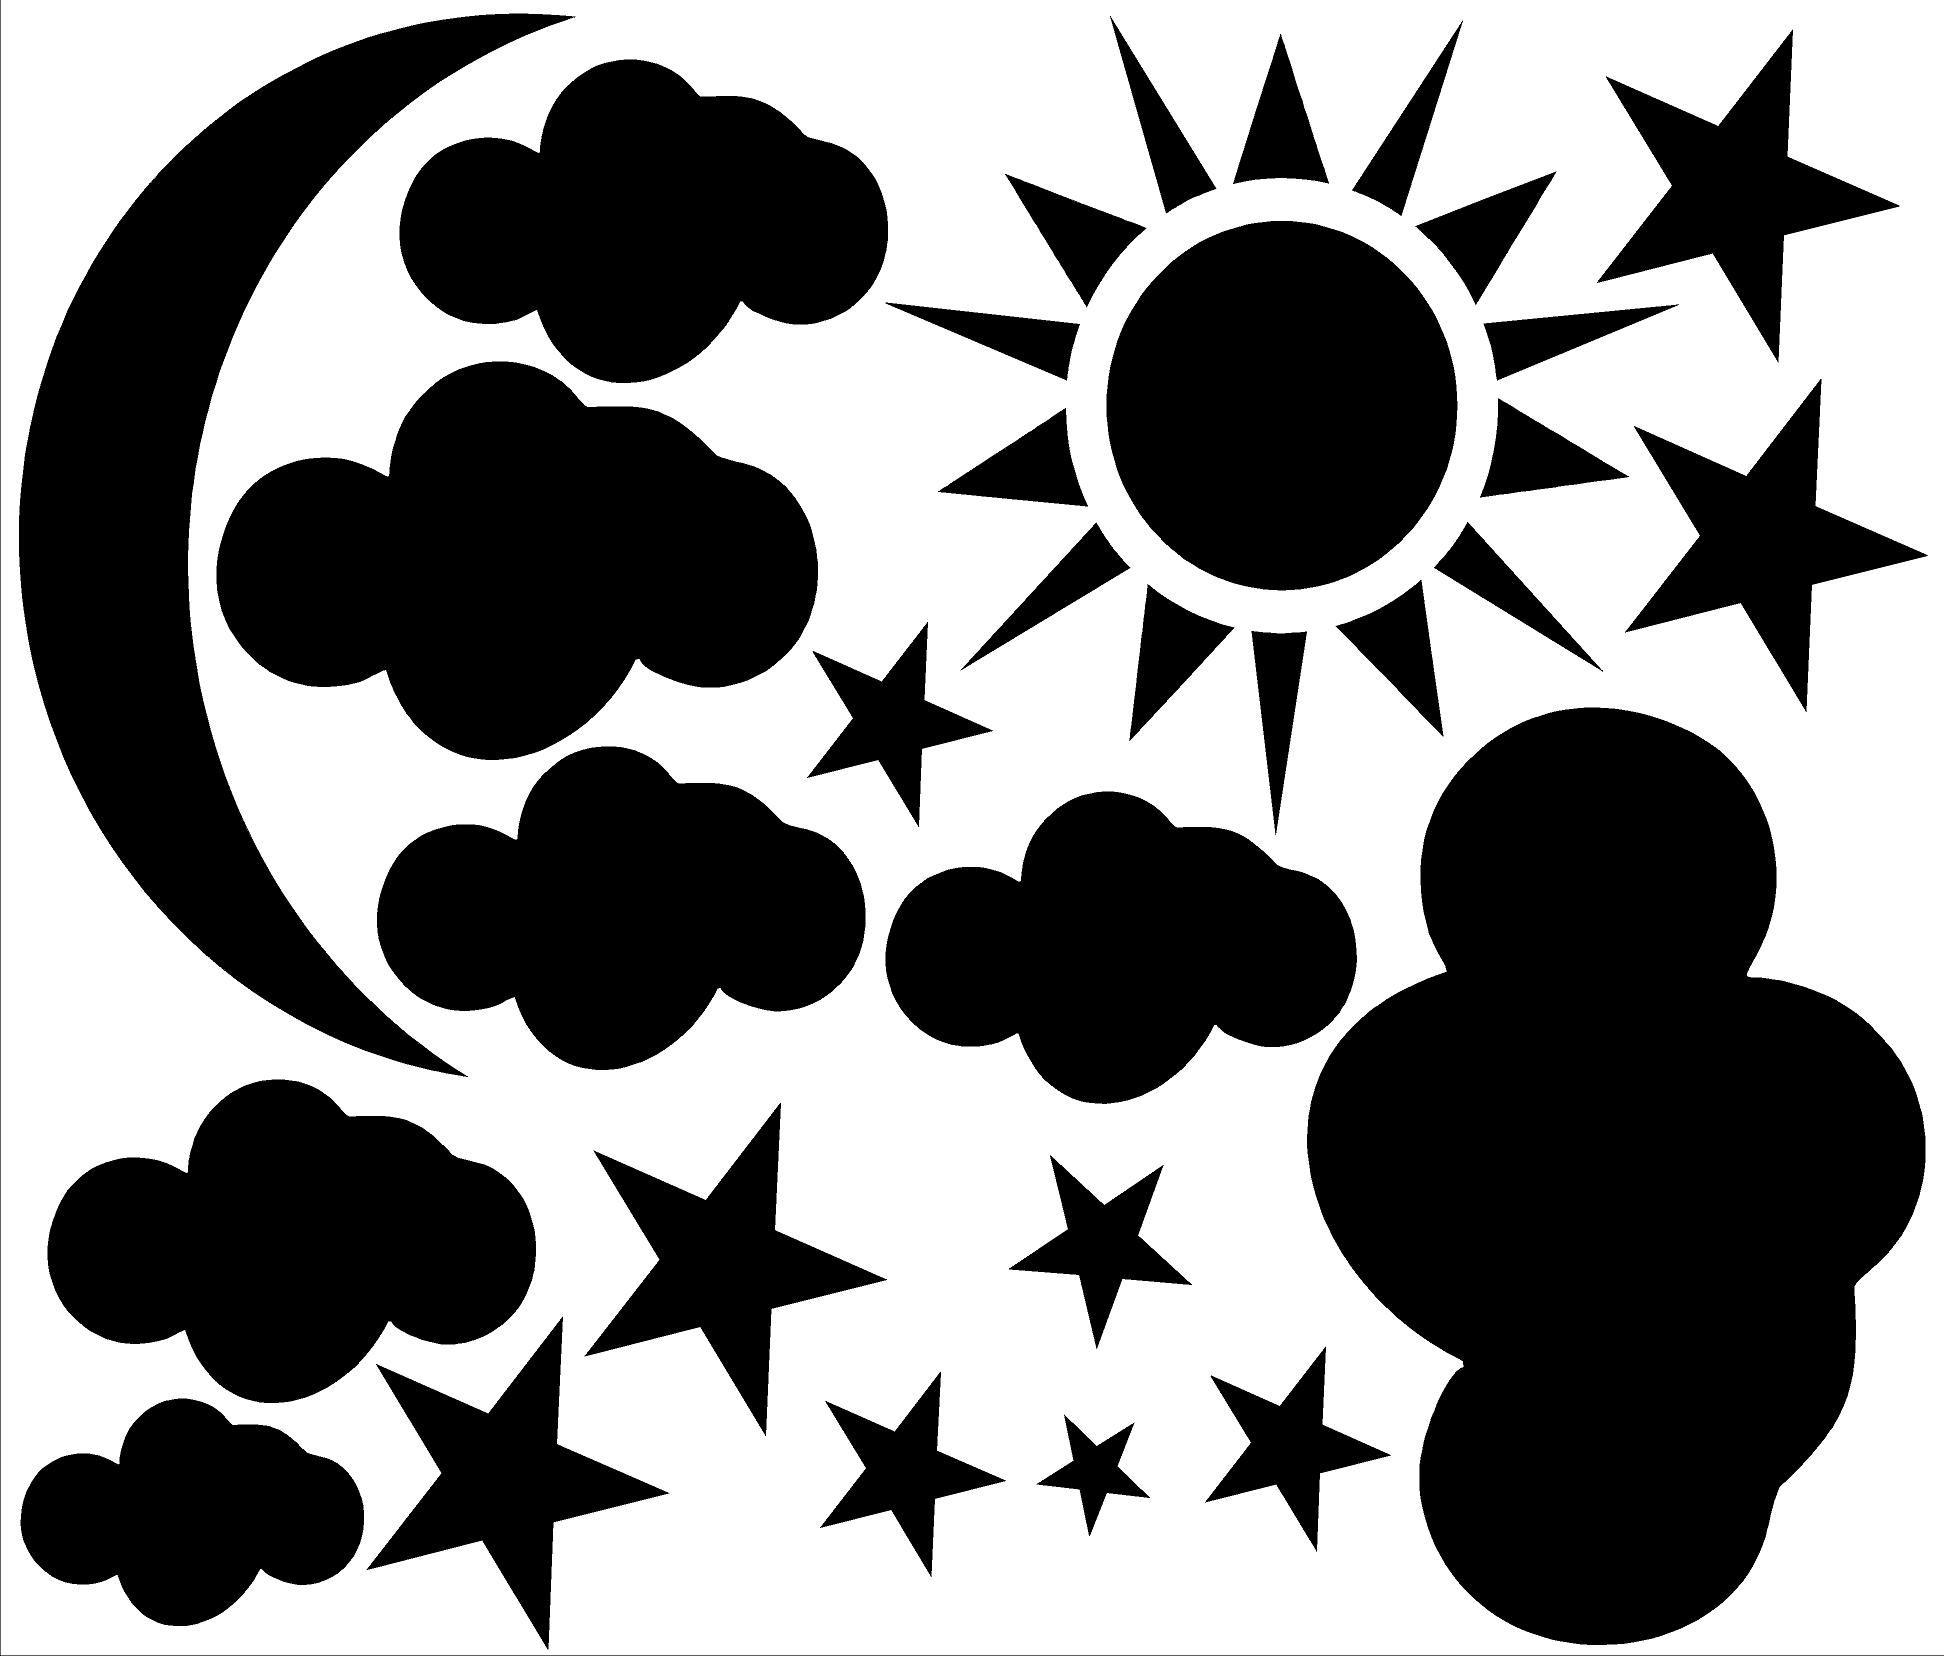 Sun,Moon,Cloud,Stars Vinyl Wall Decal Moon silhouette